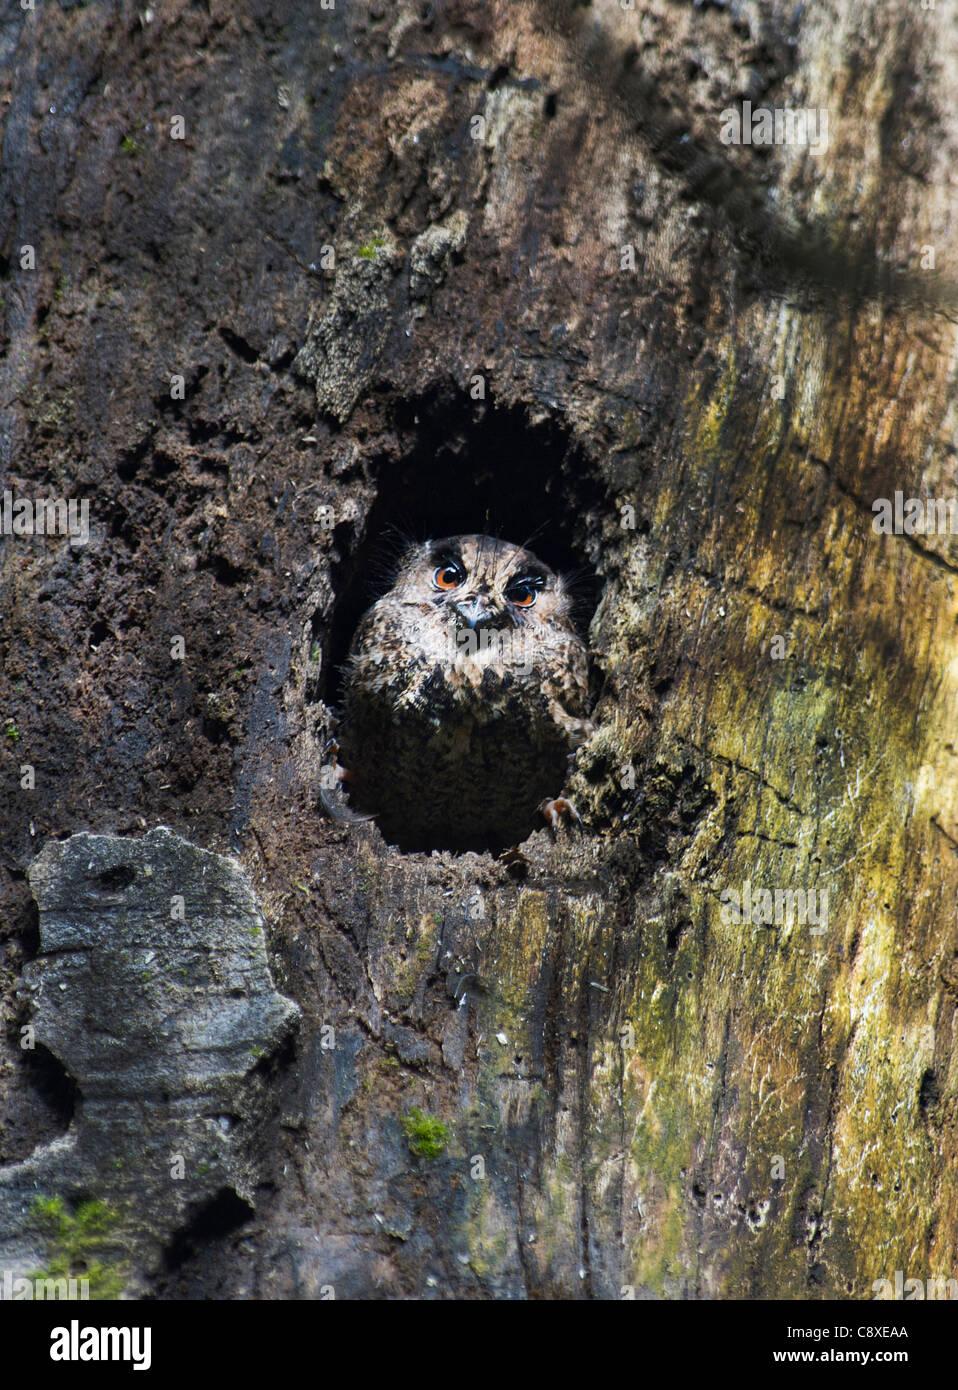 Feline Owlet-Nightjar Aegotheles insignis Tari Southern Highlands Papua New Guinea - Stock Image